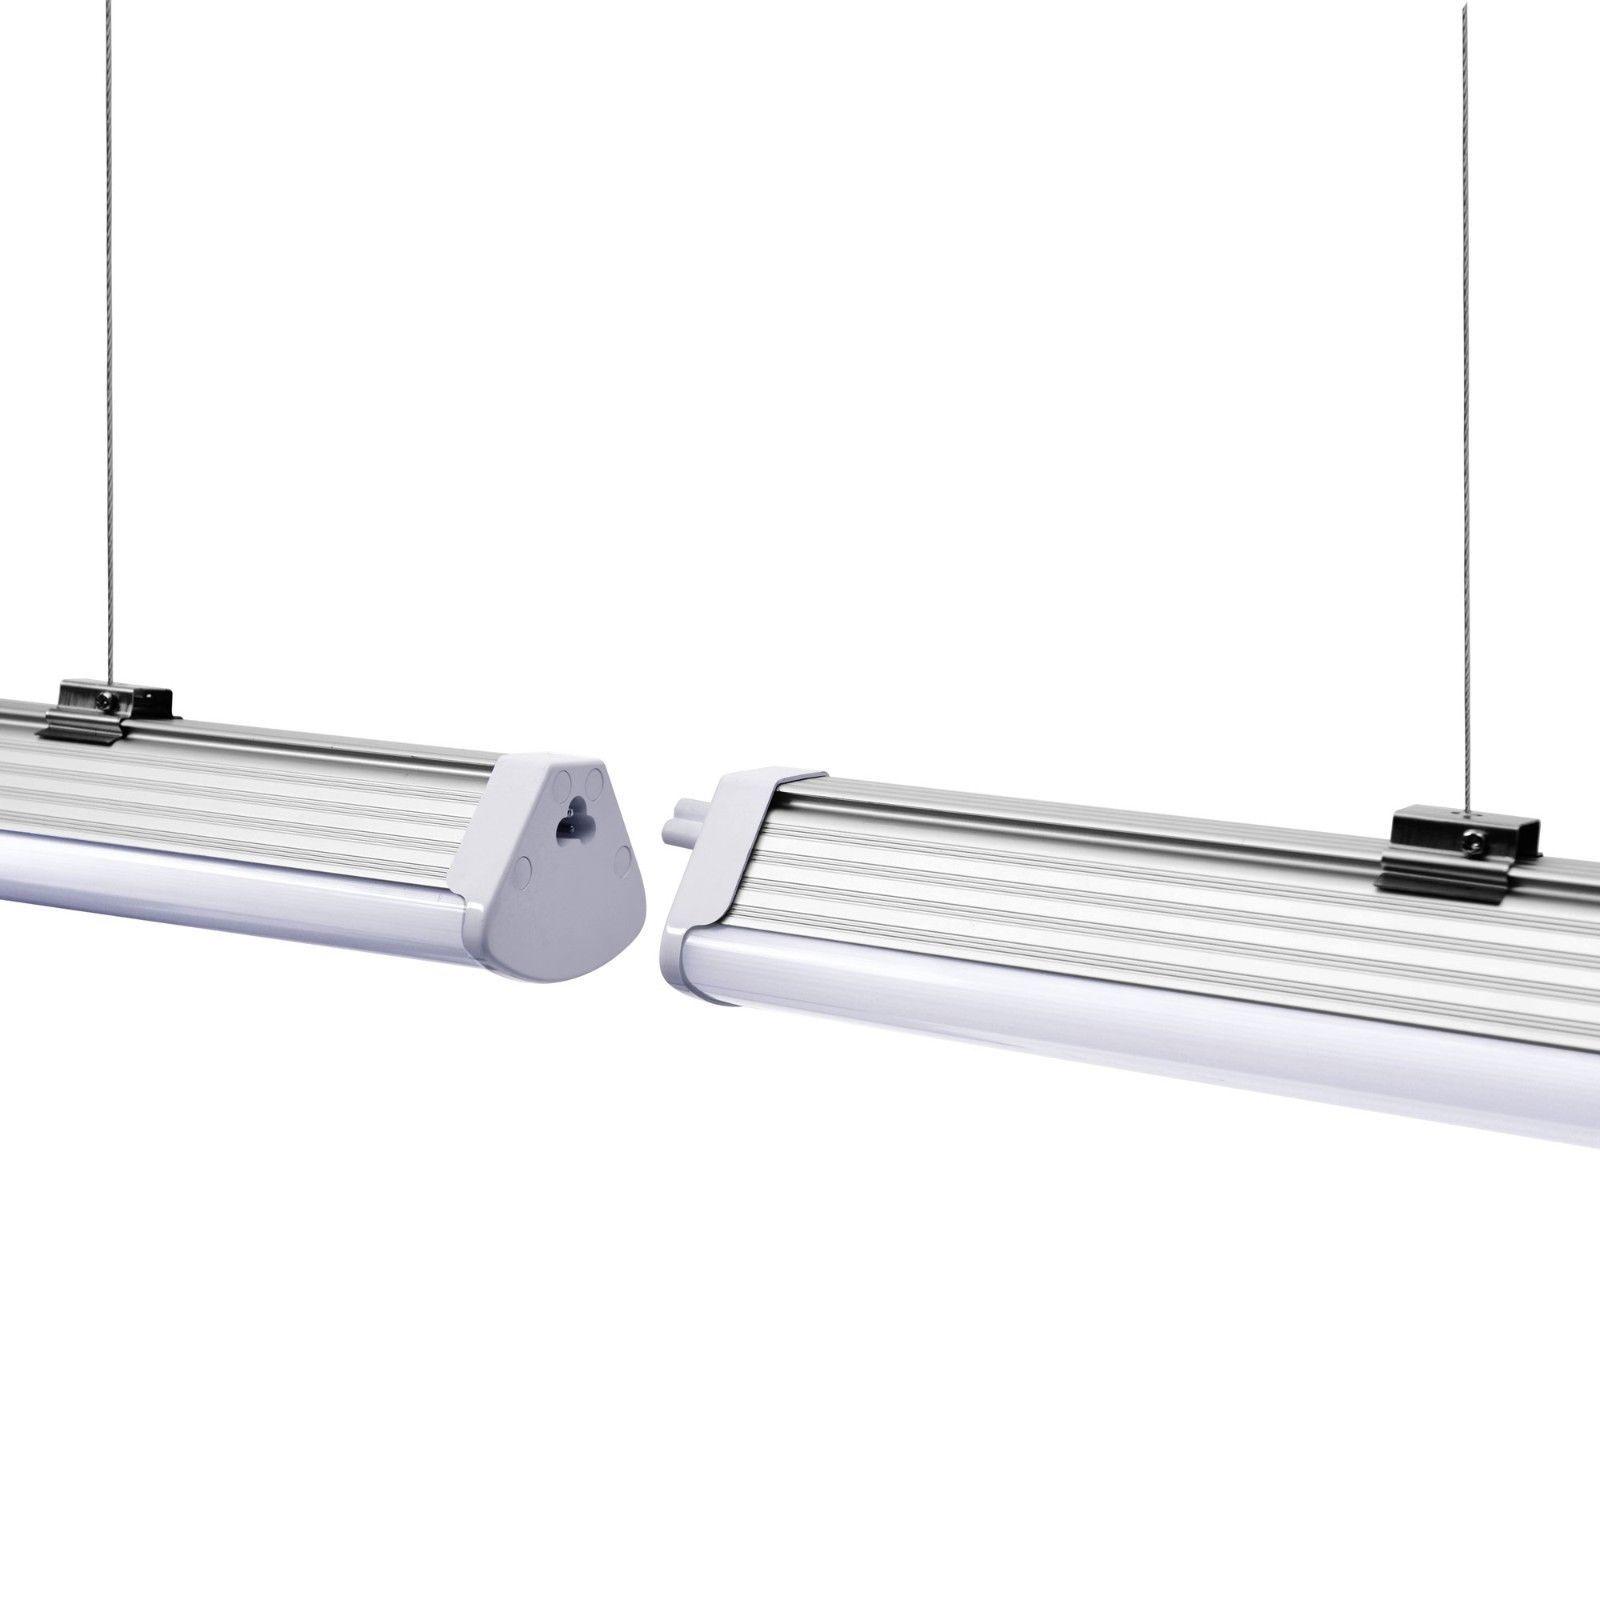 Led Linear Hallenleuchte Tube Rohre Leuchte 40w 60w Wannenleuchte Lichtleiste Ebay Led Lichtleiste Wanne